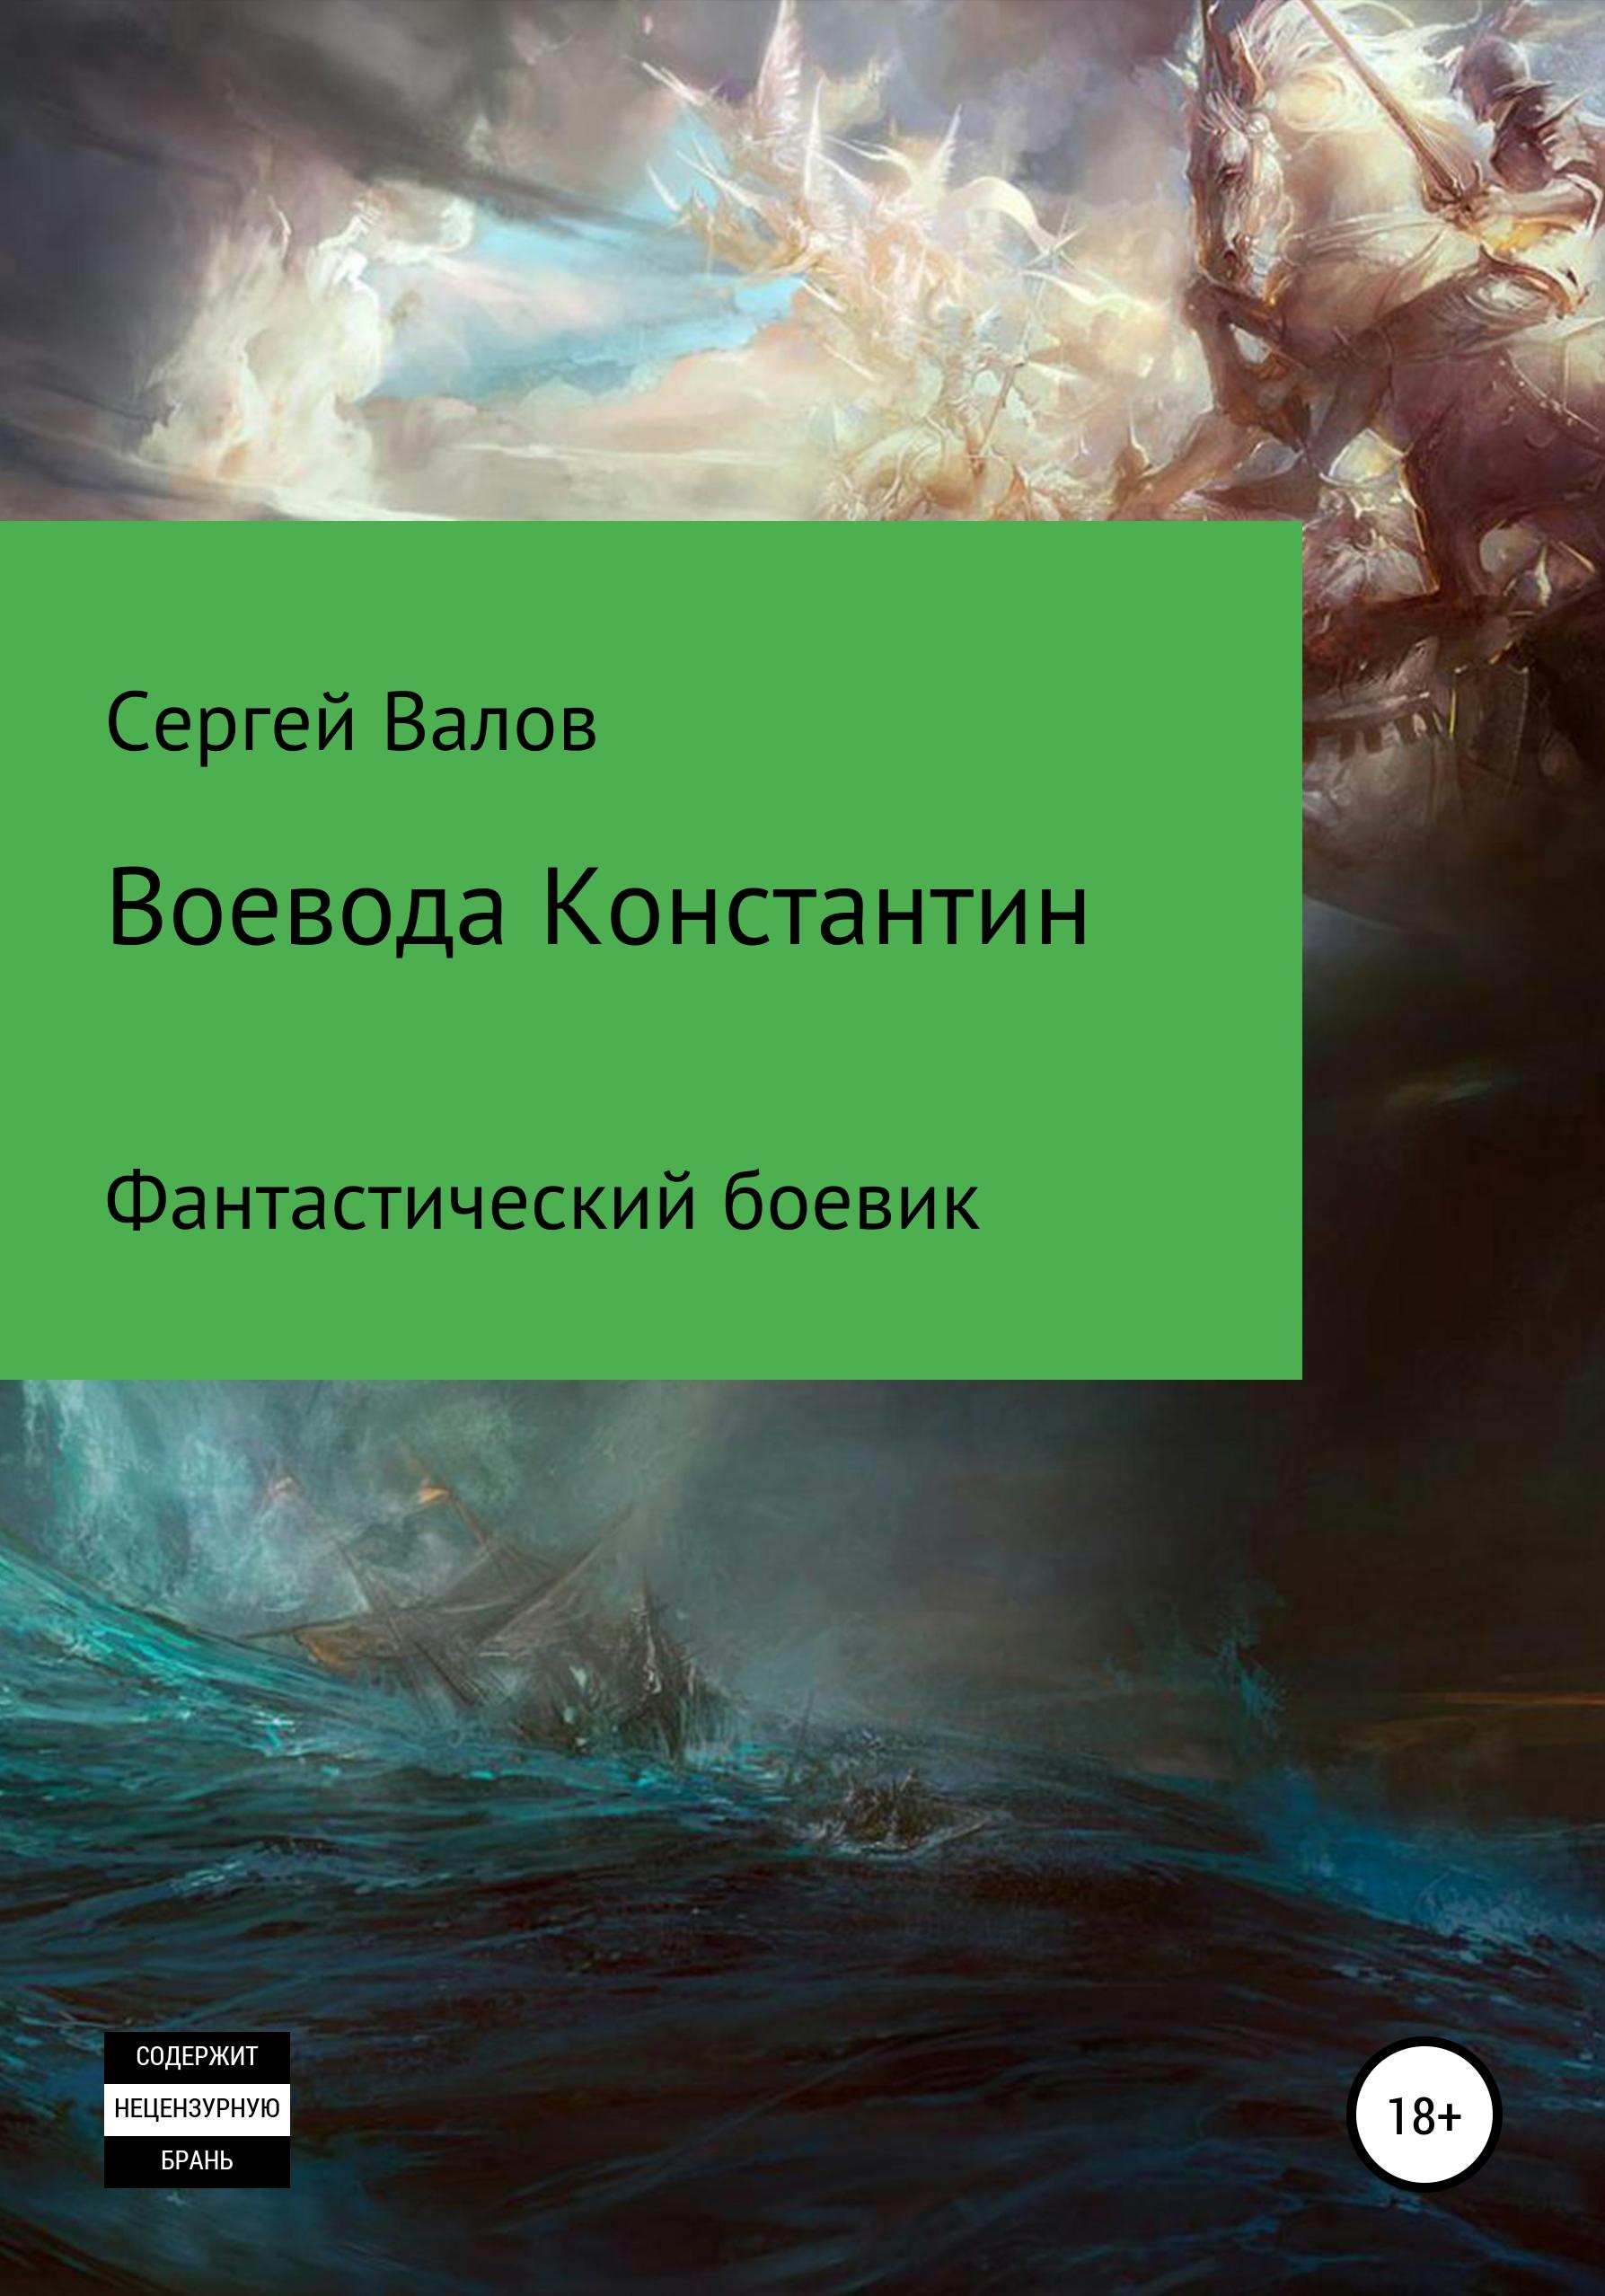 Купить книгу Воевода Константин, автора Сергея Юрьевича Валова